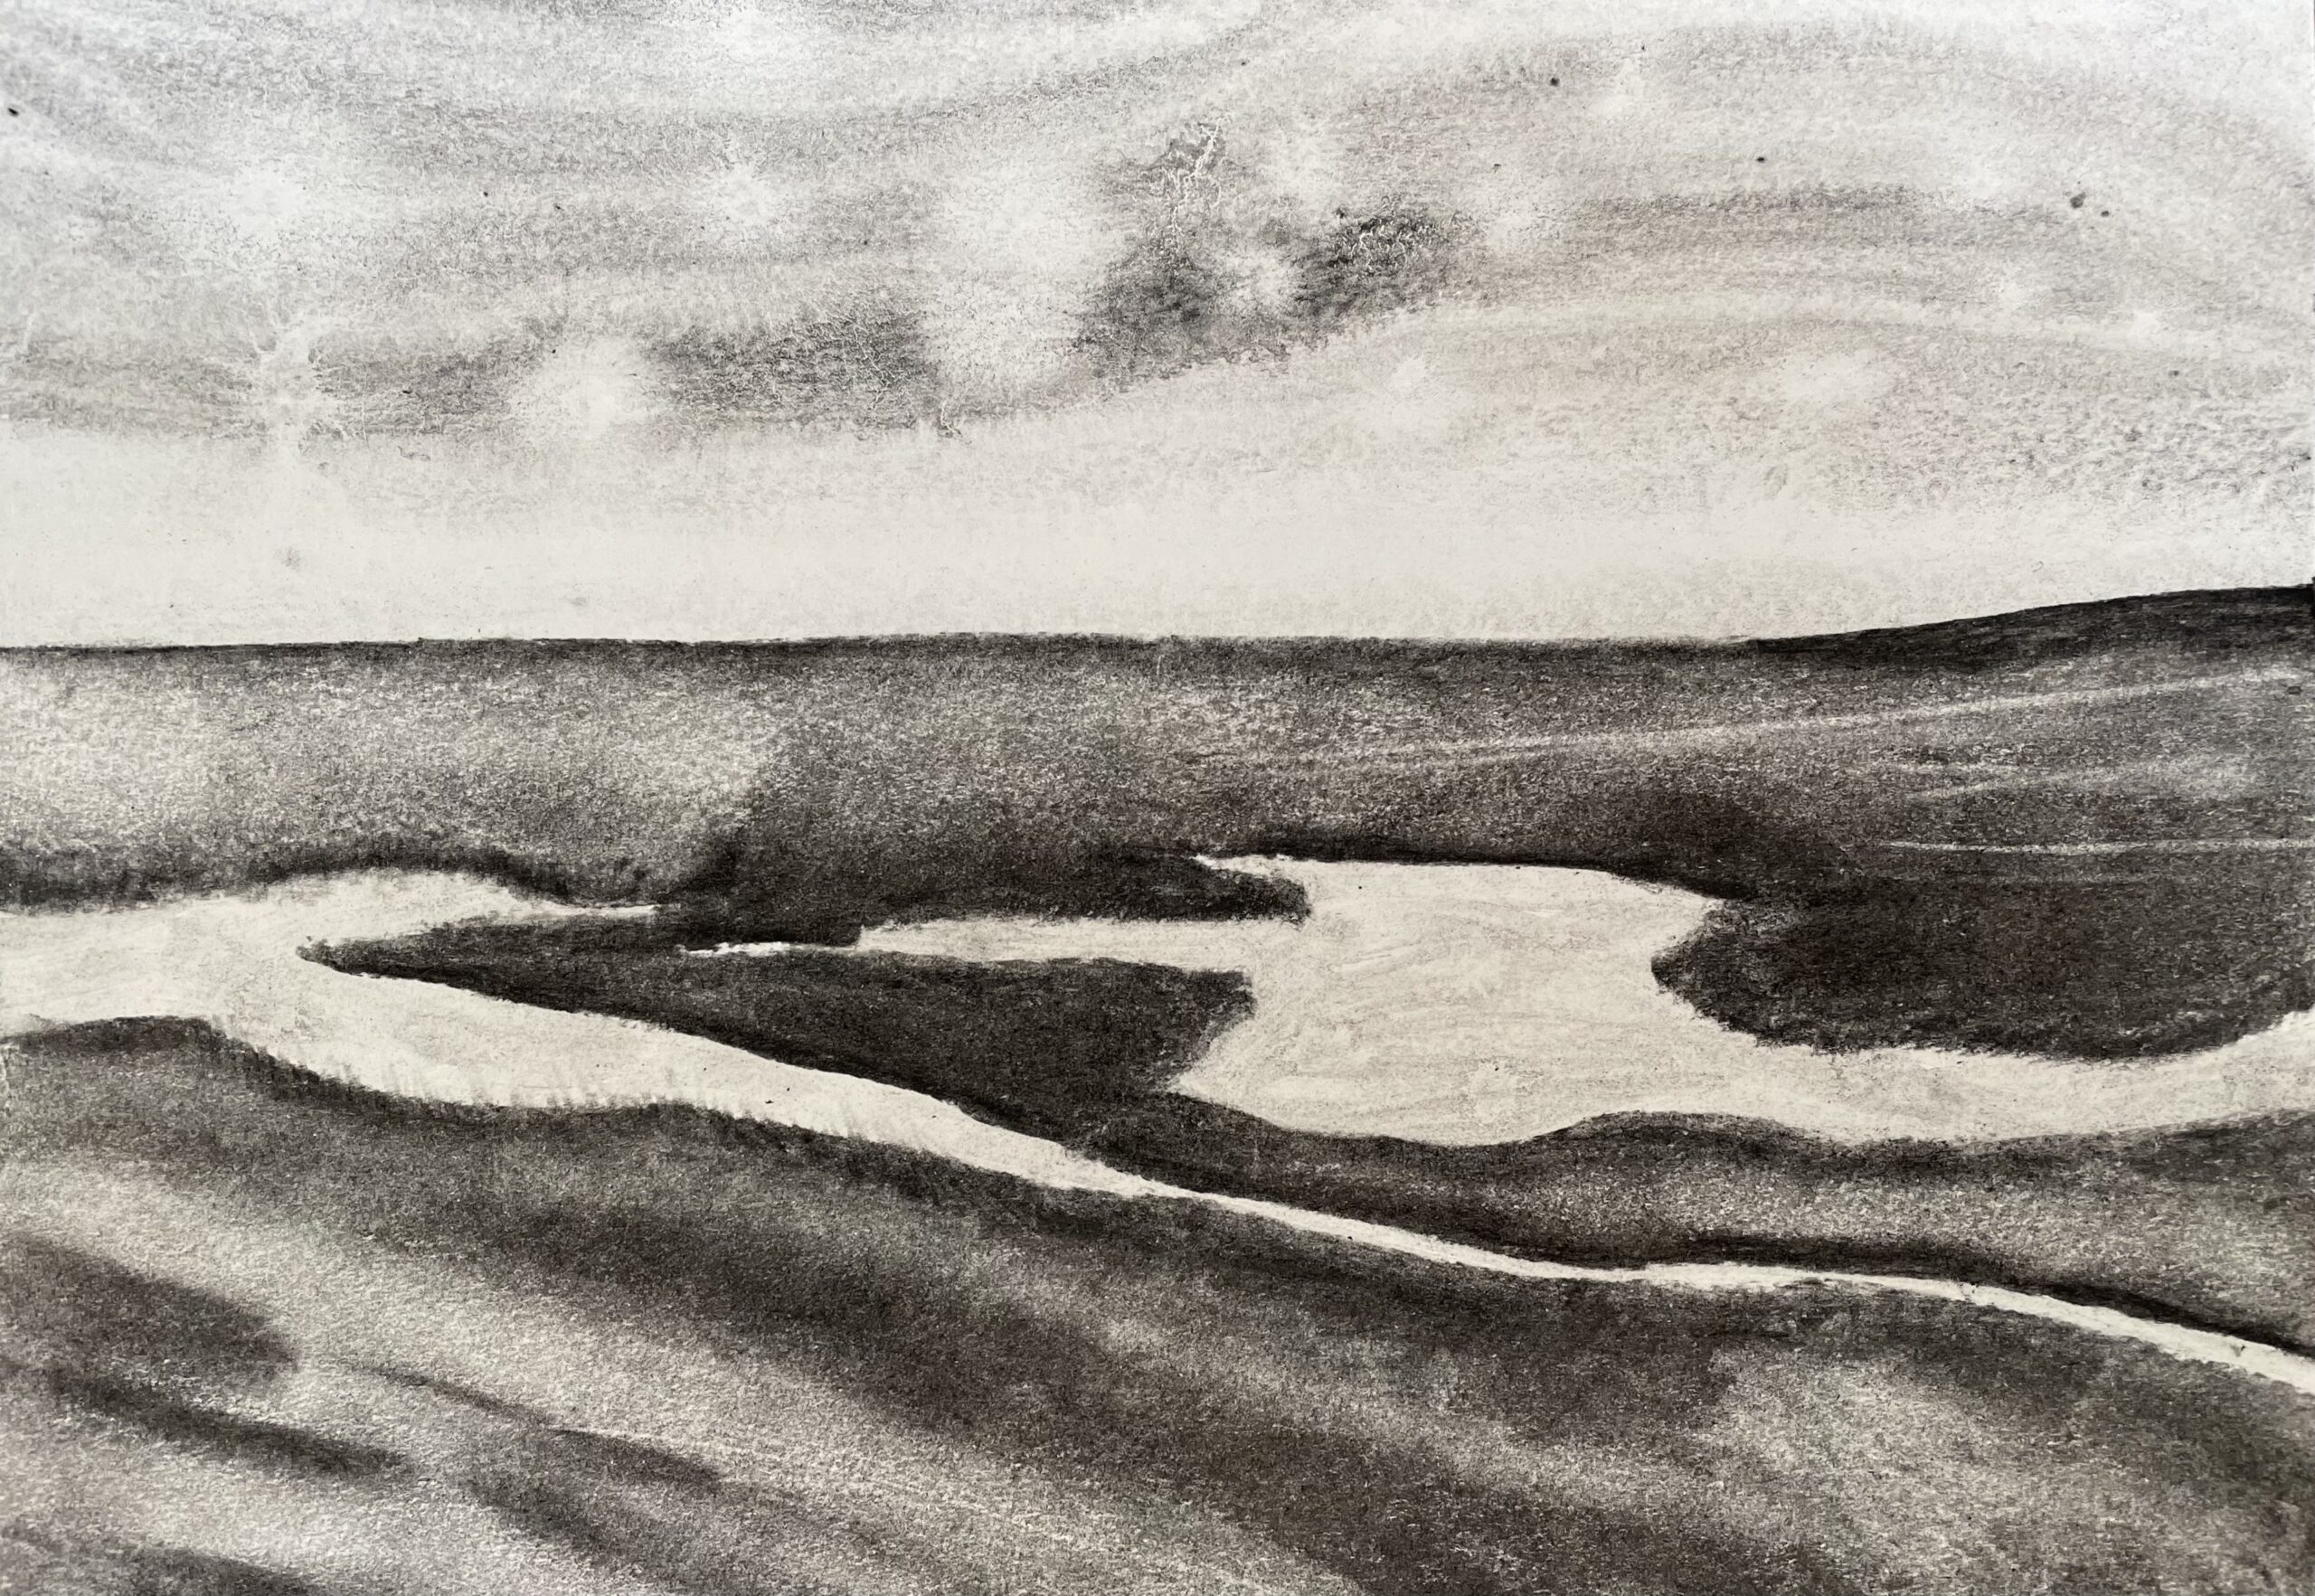 Stiffkey V saltmarsh charcoal drawing